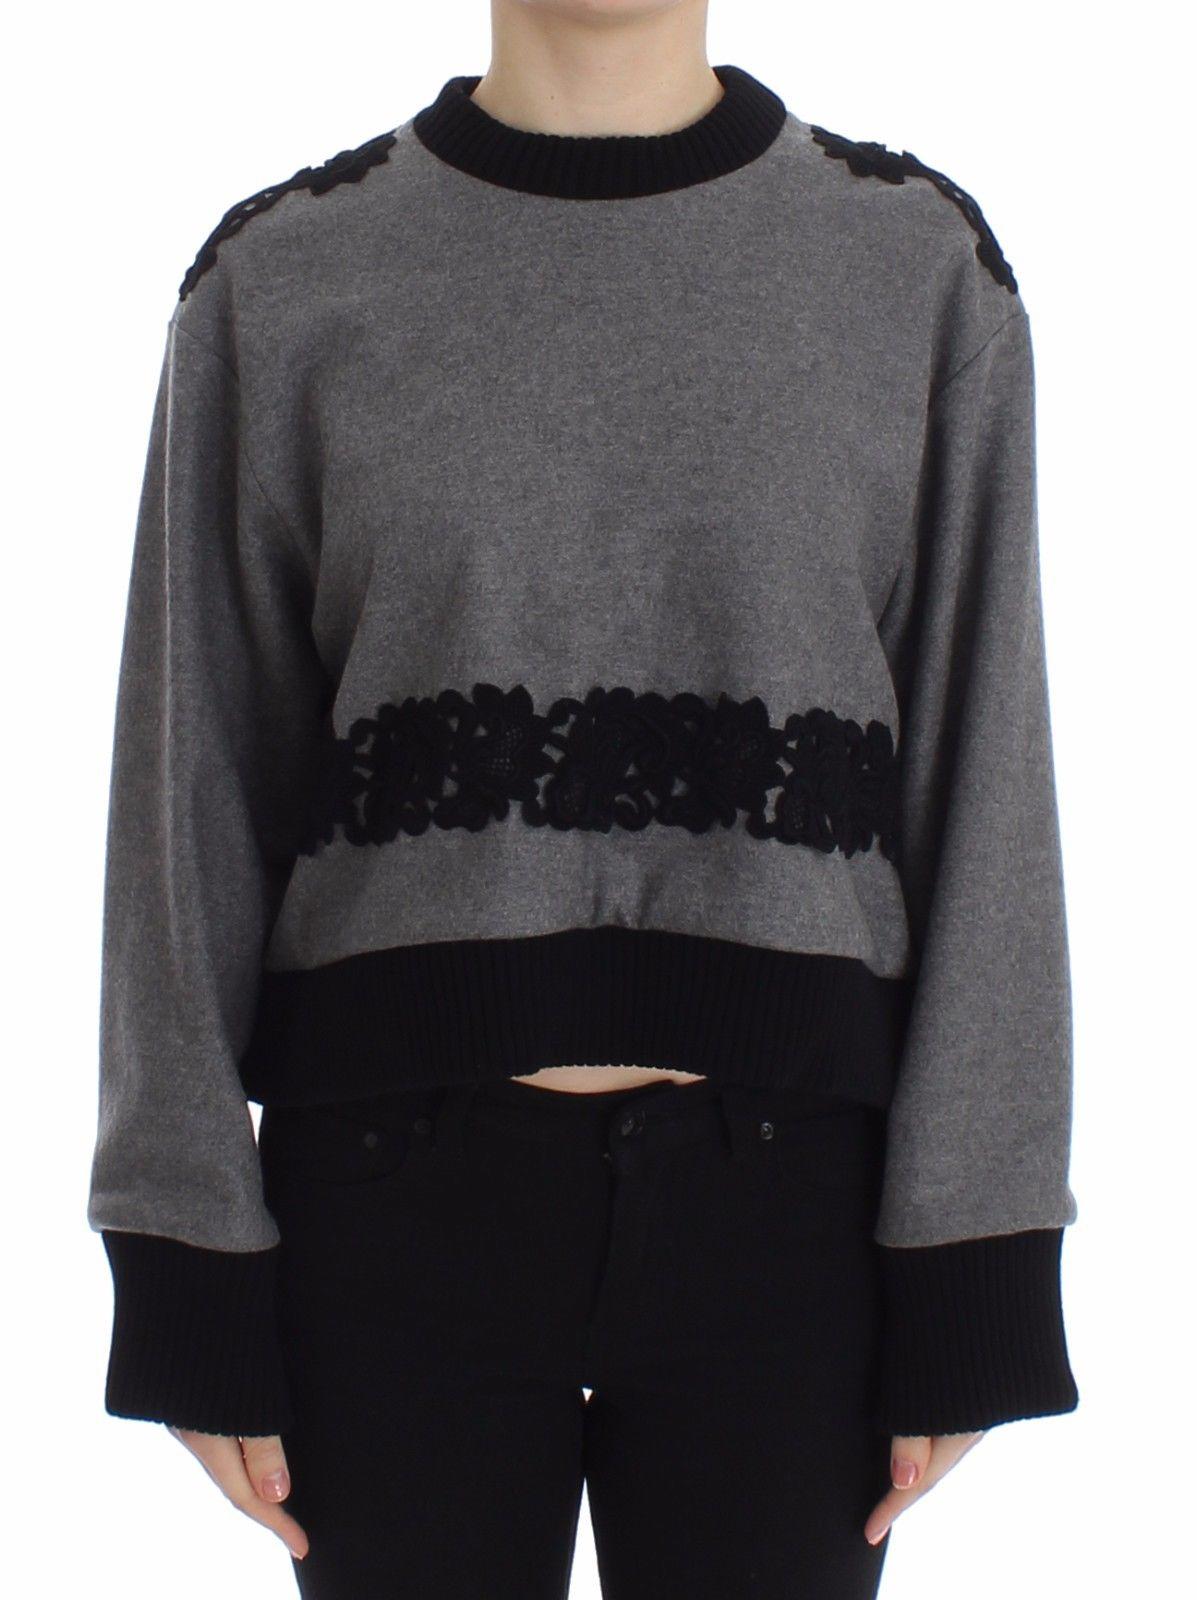 Dolce & Gabbana Women's Lace Wool Cashmere Sweater Gray SIG13181 - IT44|L